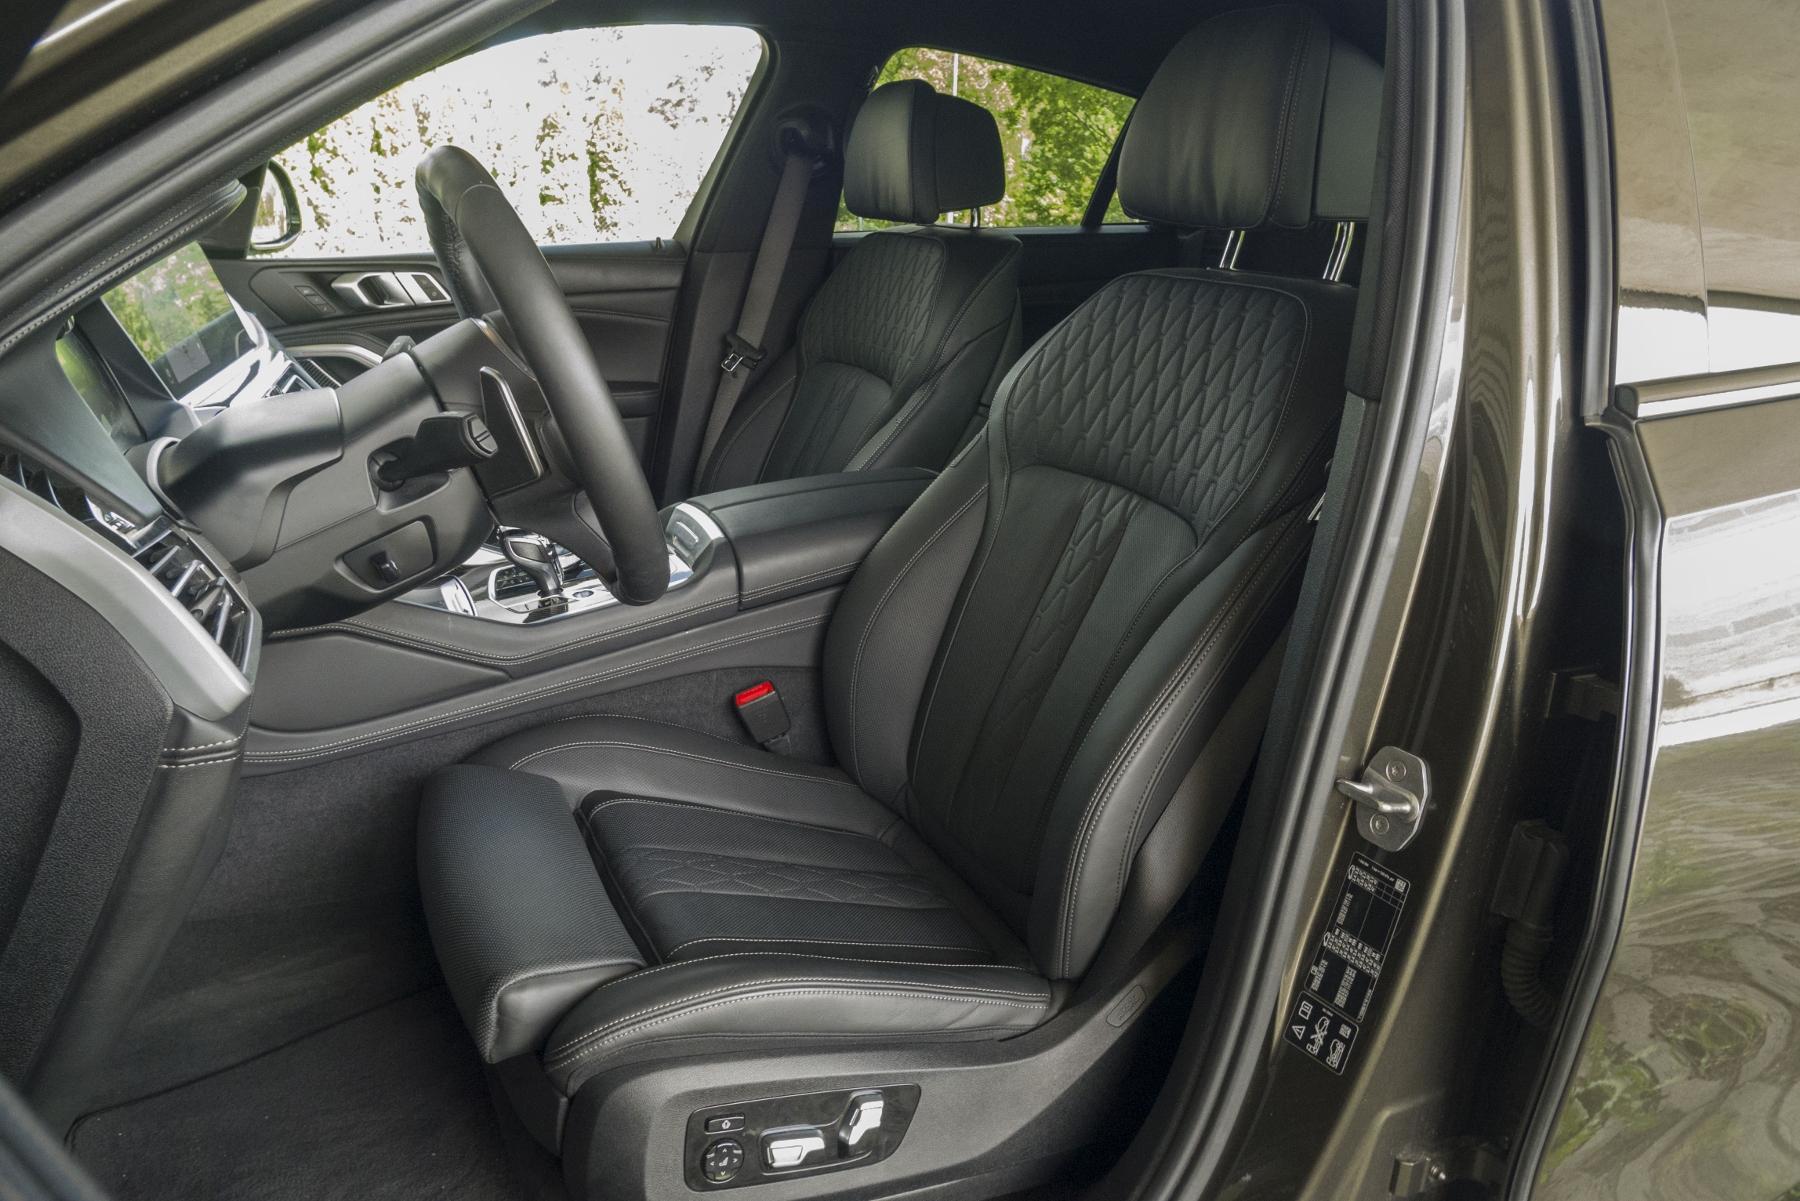 Test: BMW X6 M50i napína benzínové svaly, ale neukazuje plnú silu e2WmCluRel bmw-x6-m50i-38